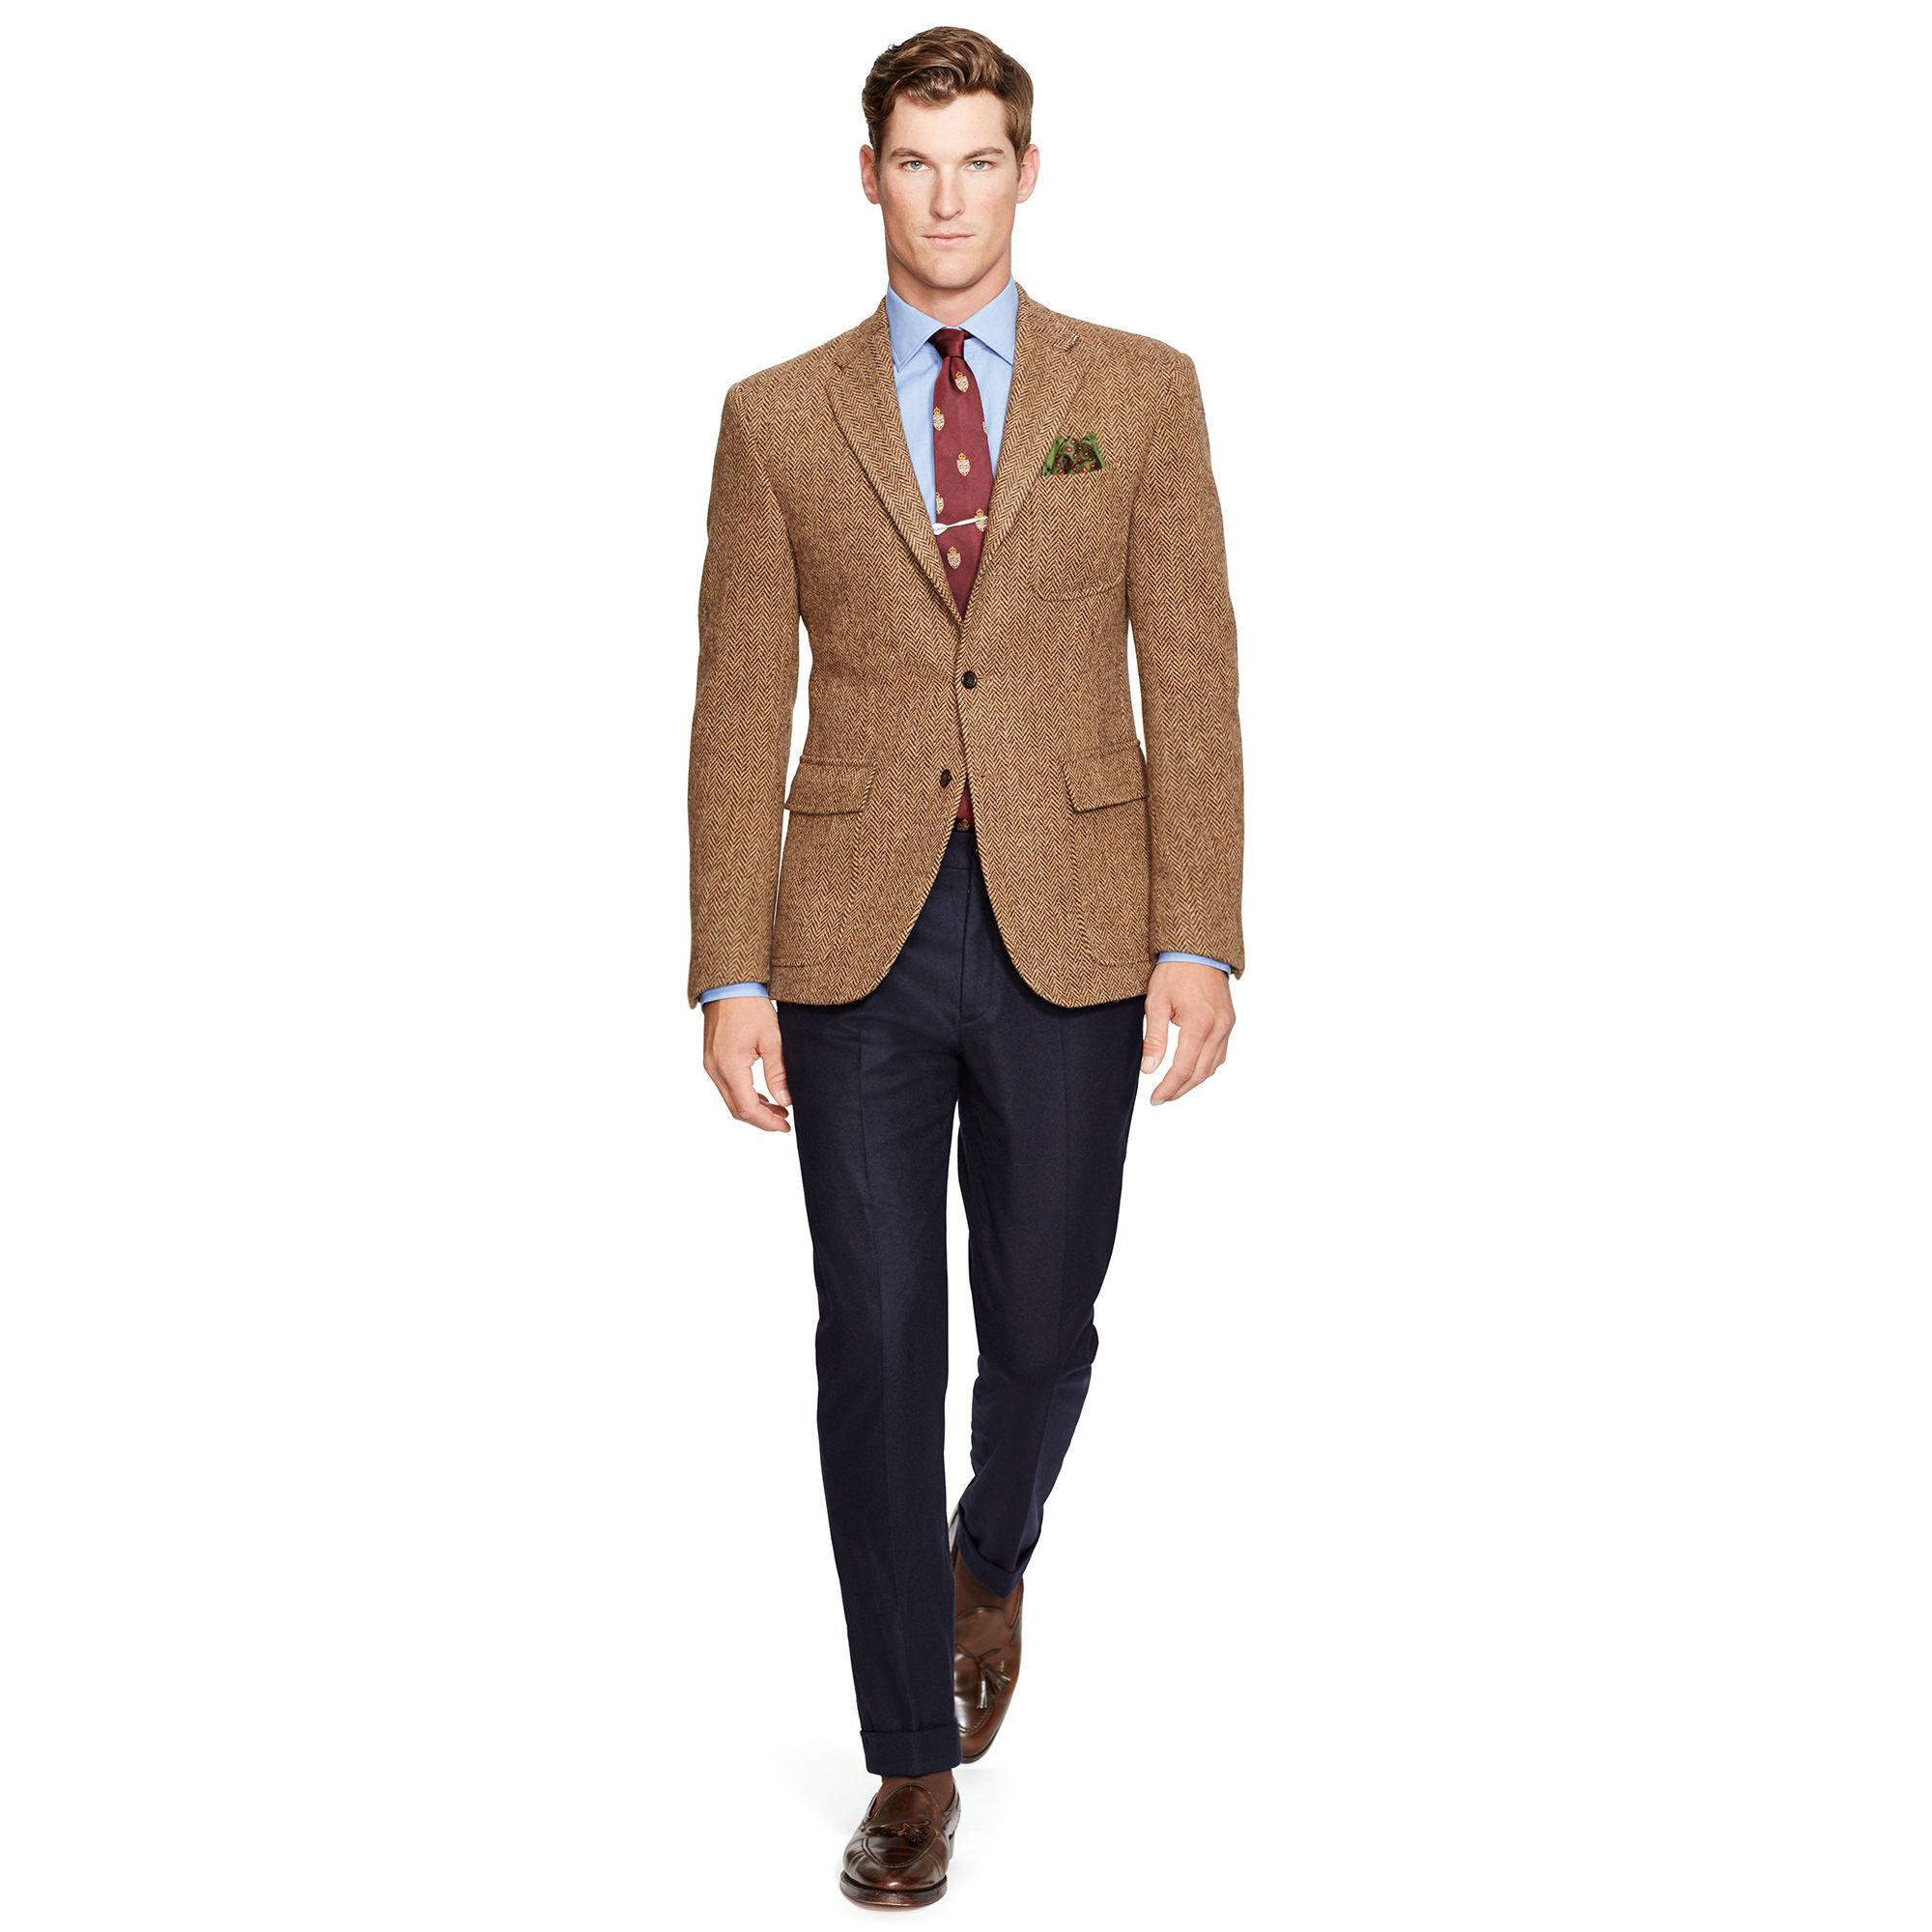 Lyst polo ralph lauren polo herringbone sport coat in for Polo shirt with sport coat